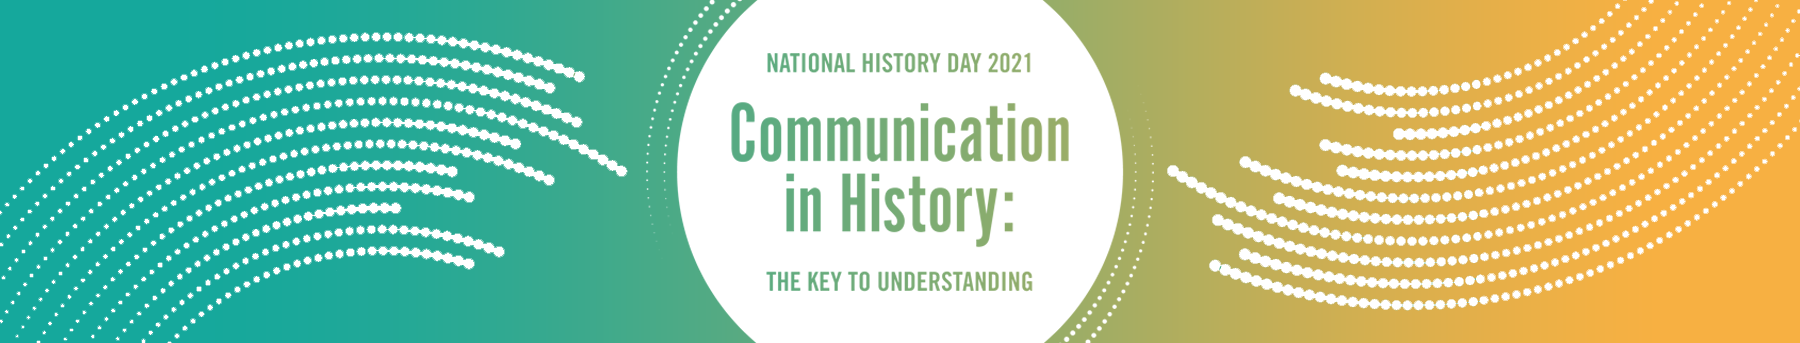 NHD 2021 Logo